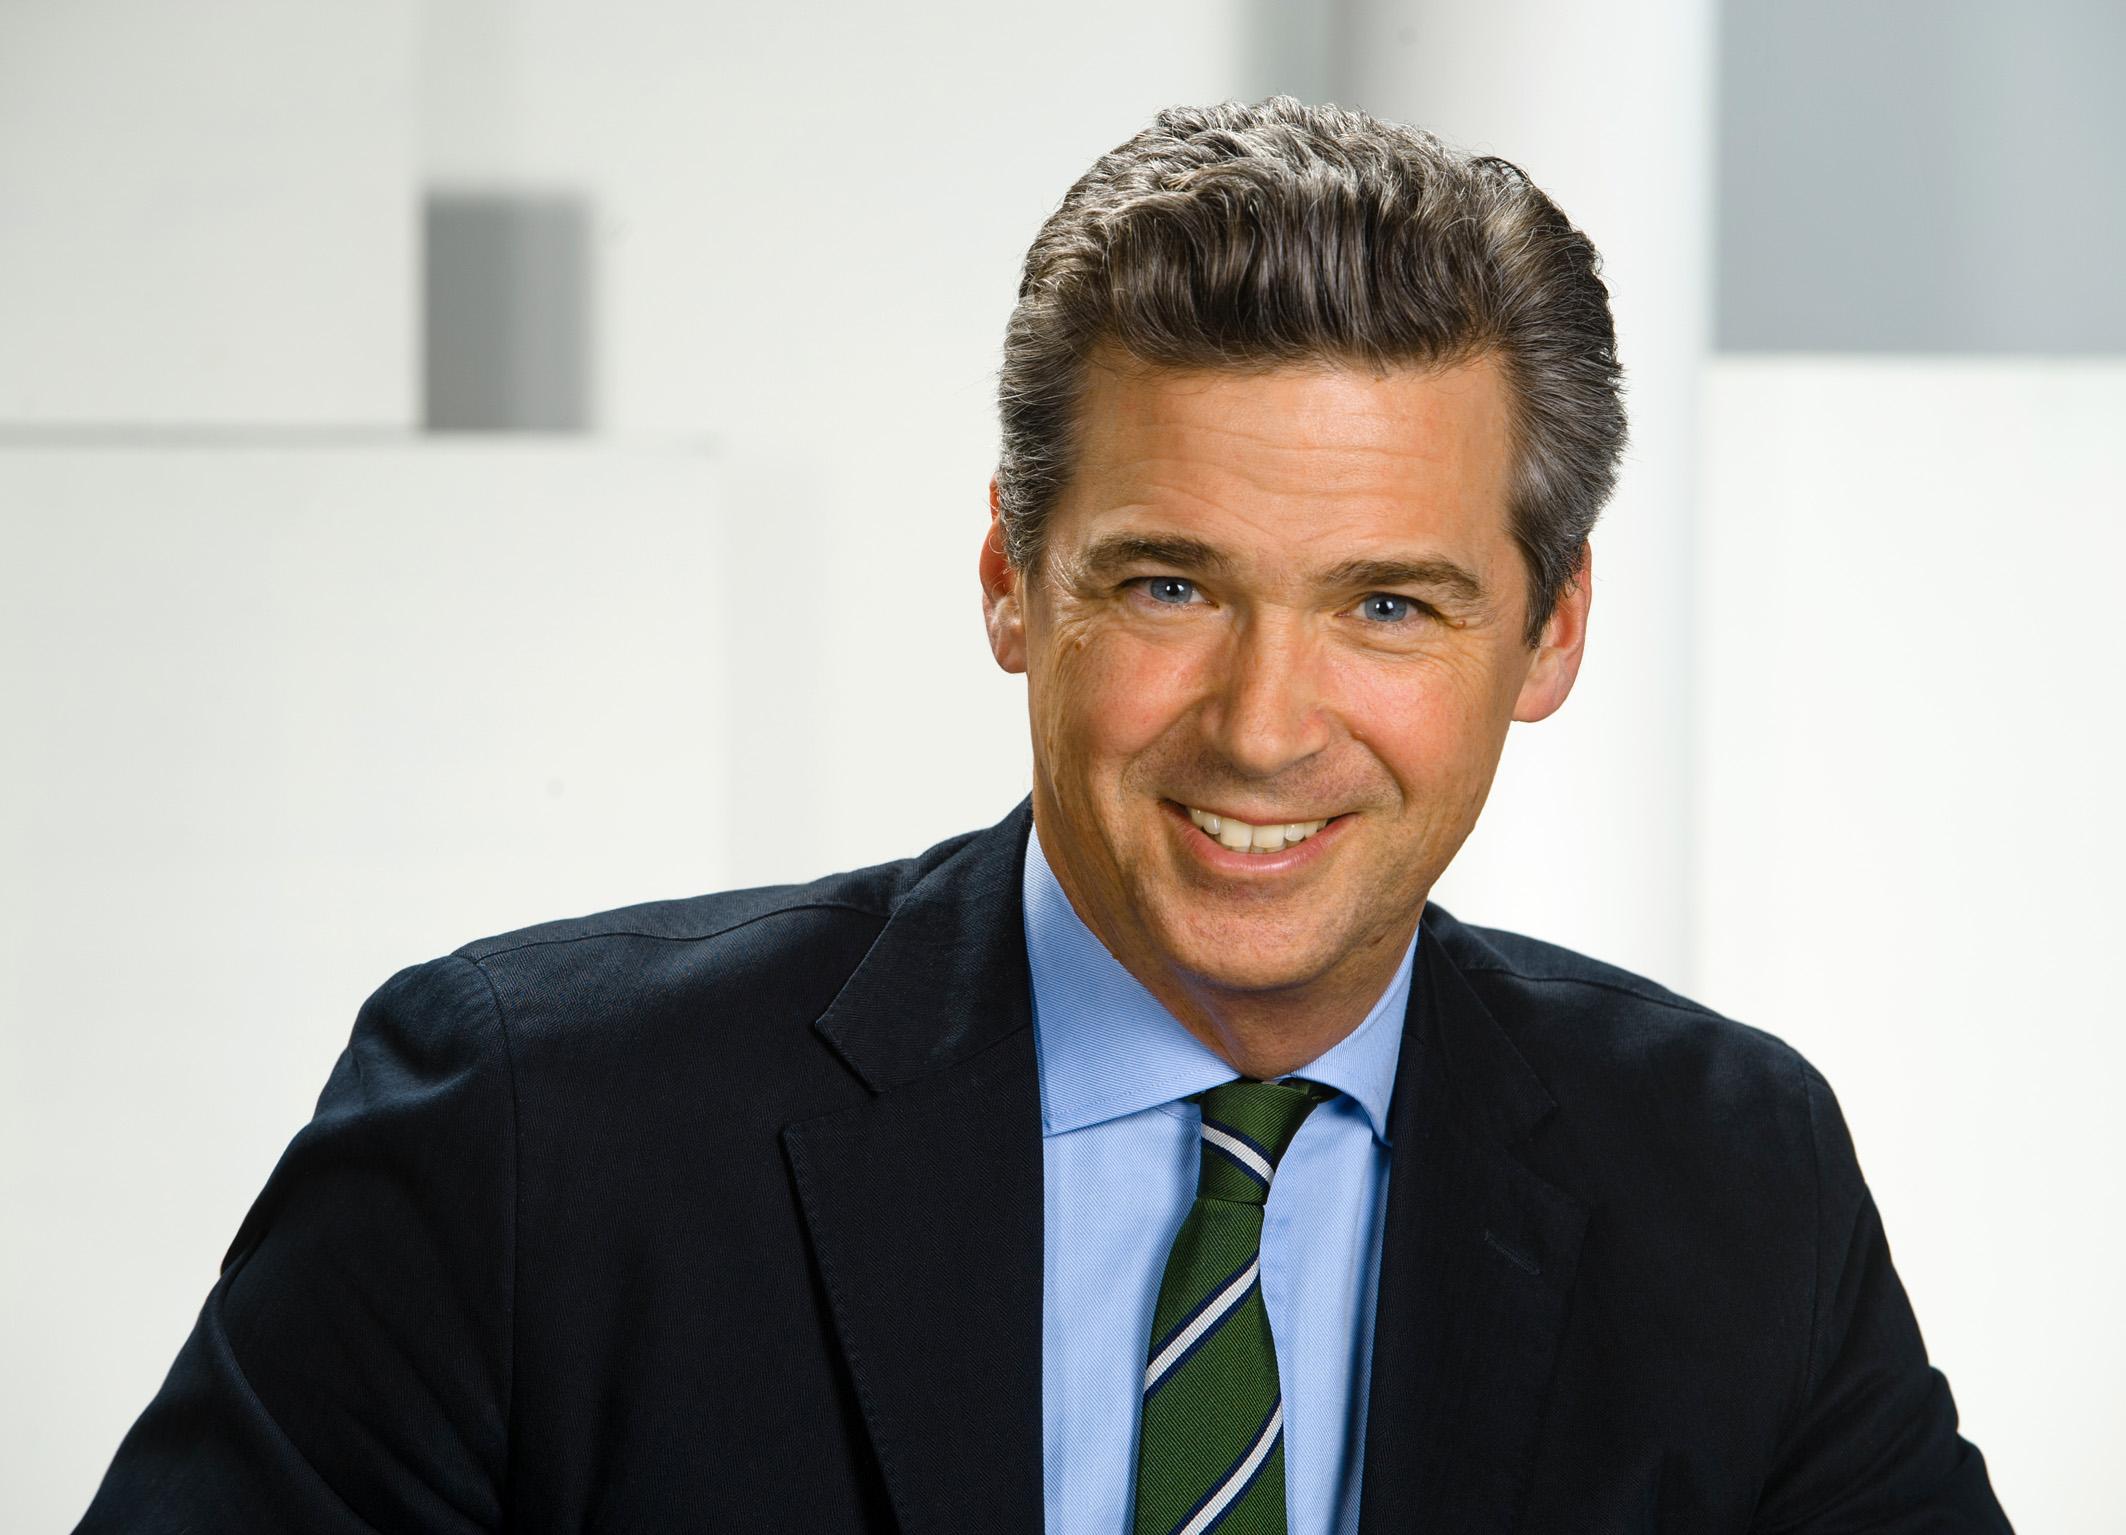 Andreas Gnesda